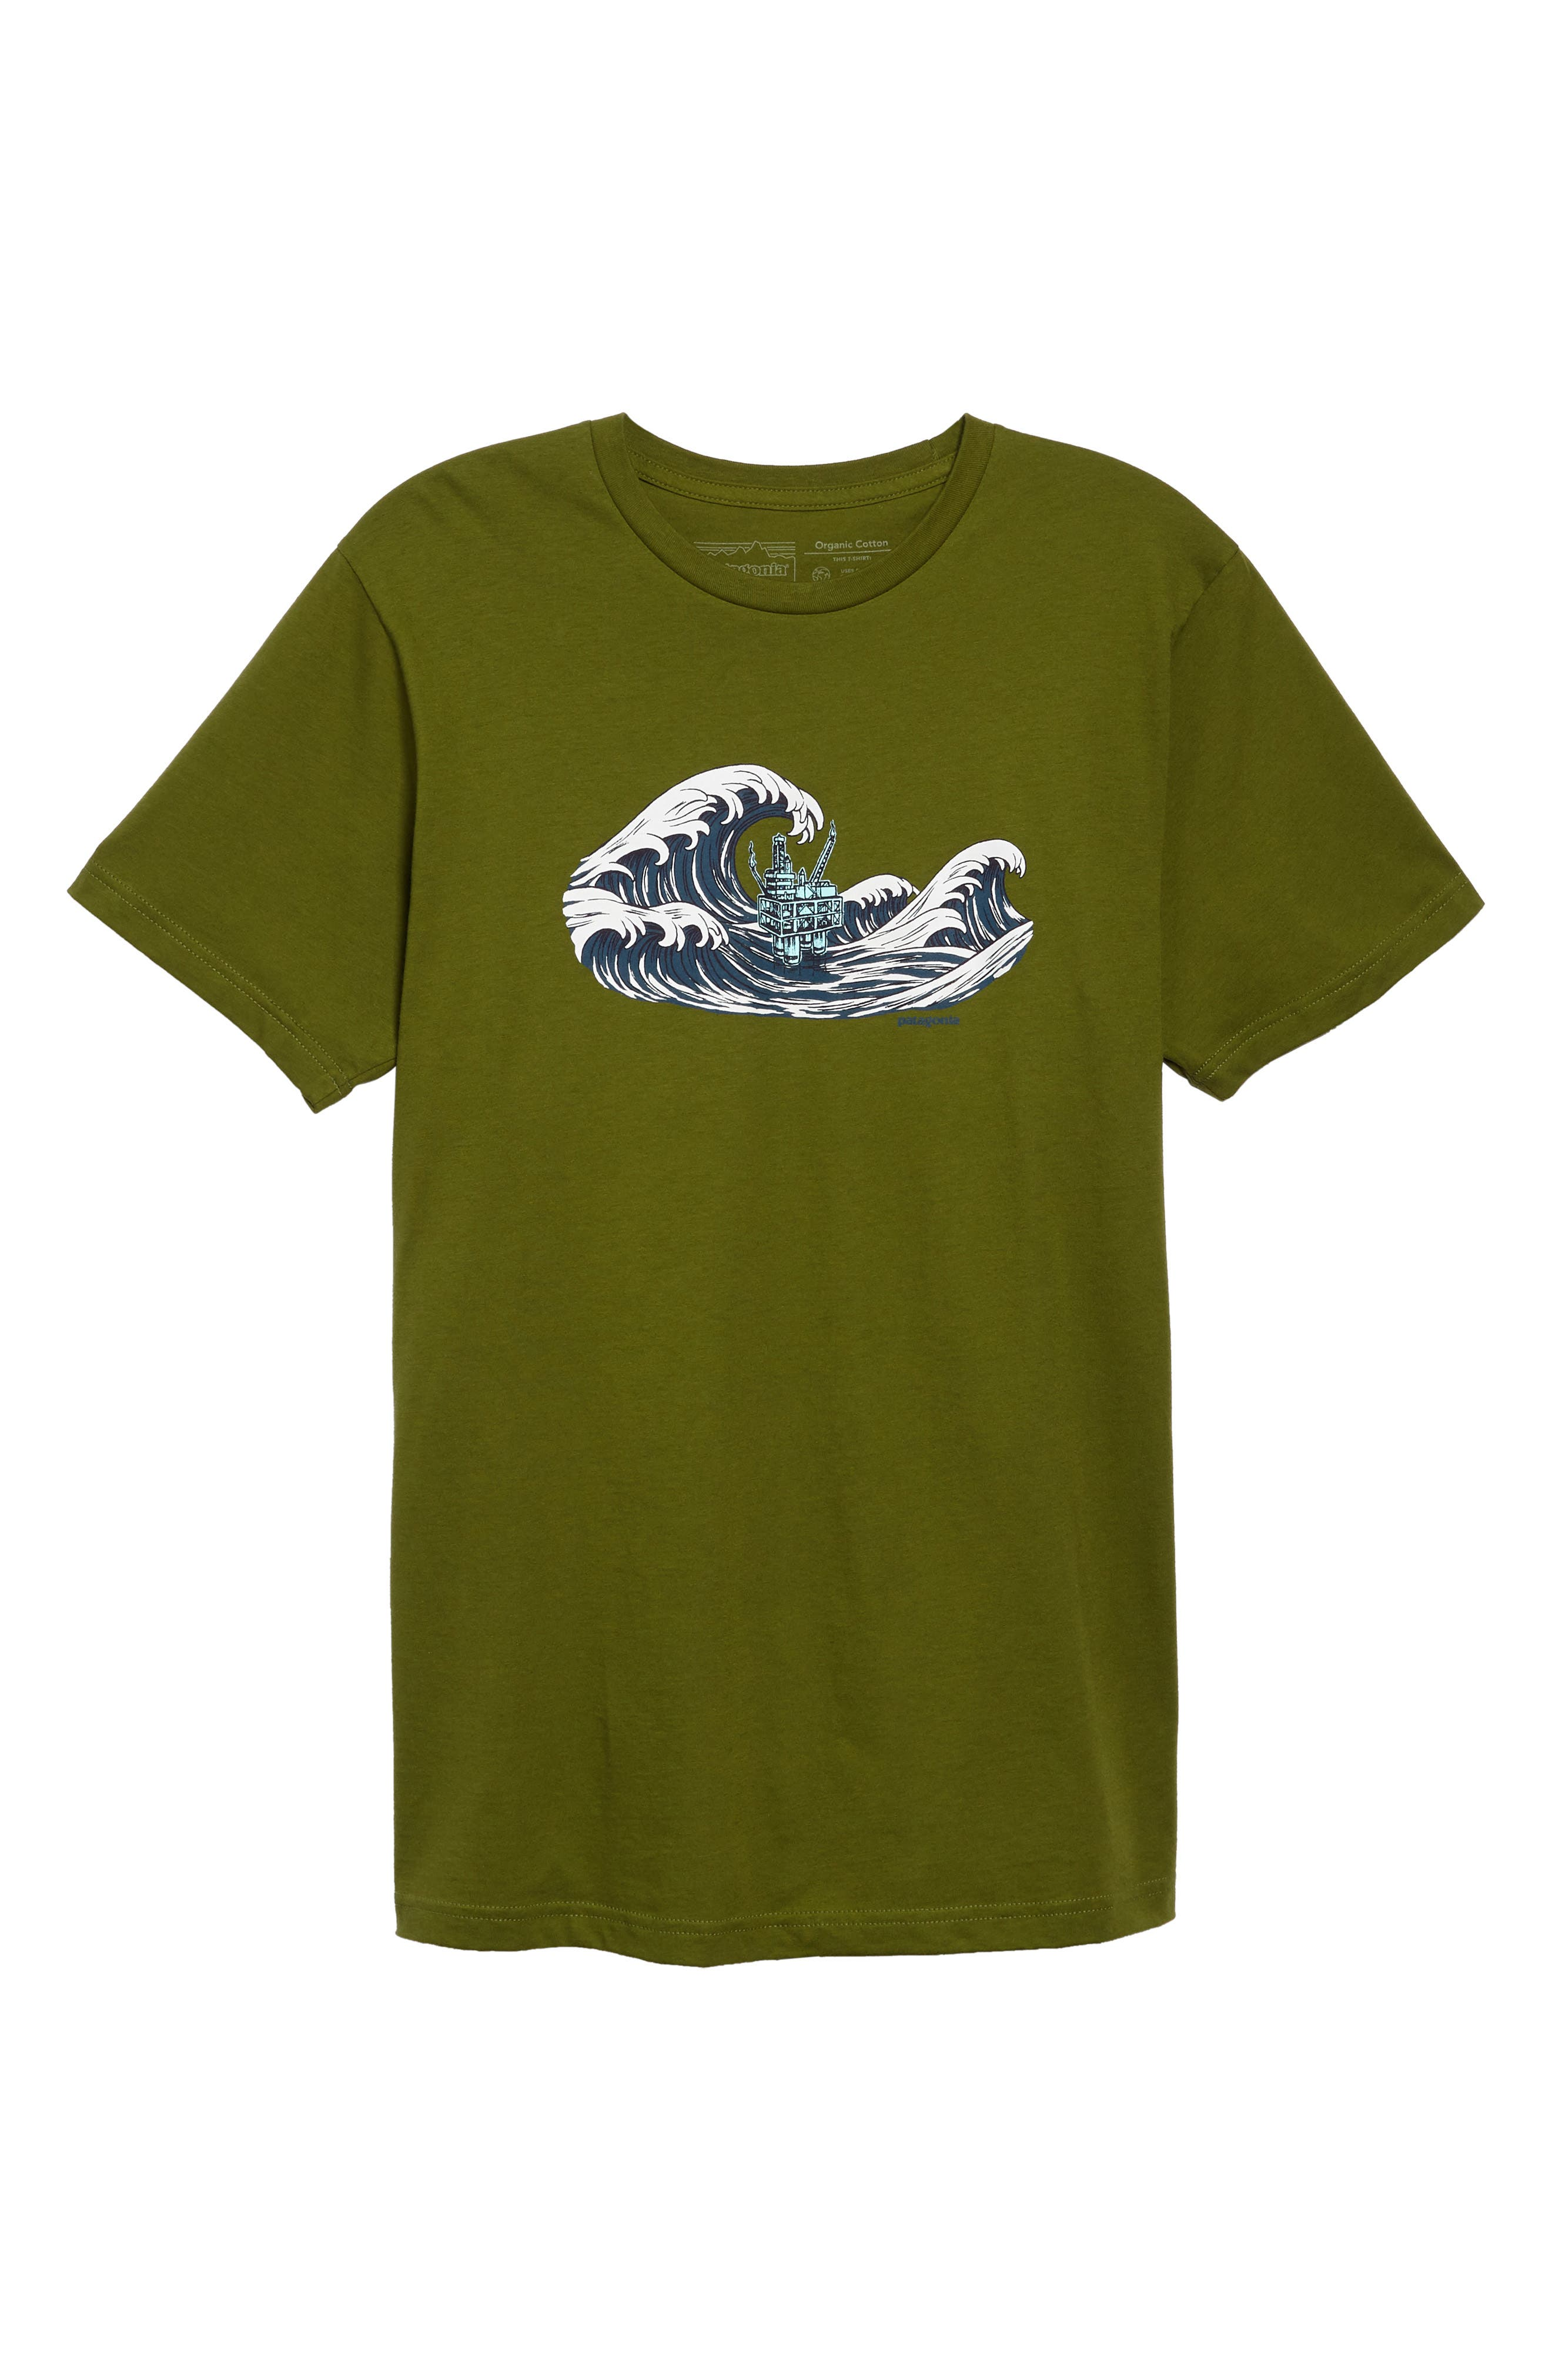 PATAGONIA,                             Oily Olas Slim Fit Organic Cotton T-Shirt,                             Alternate thumbnail 6, color,                             300